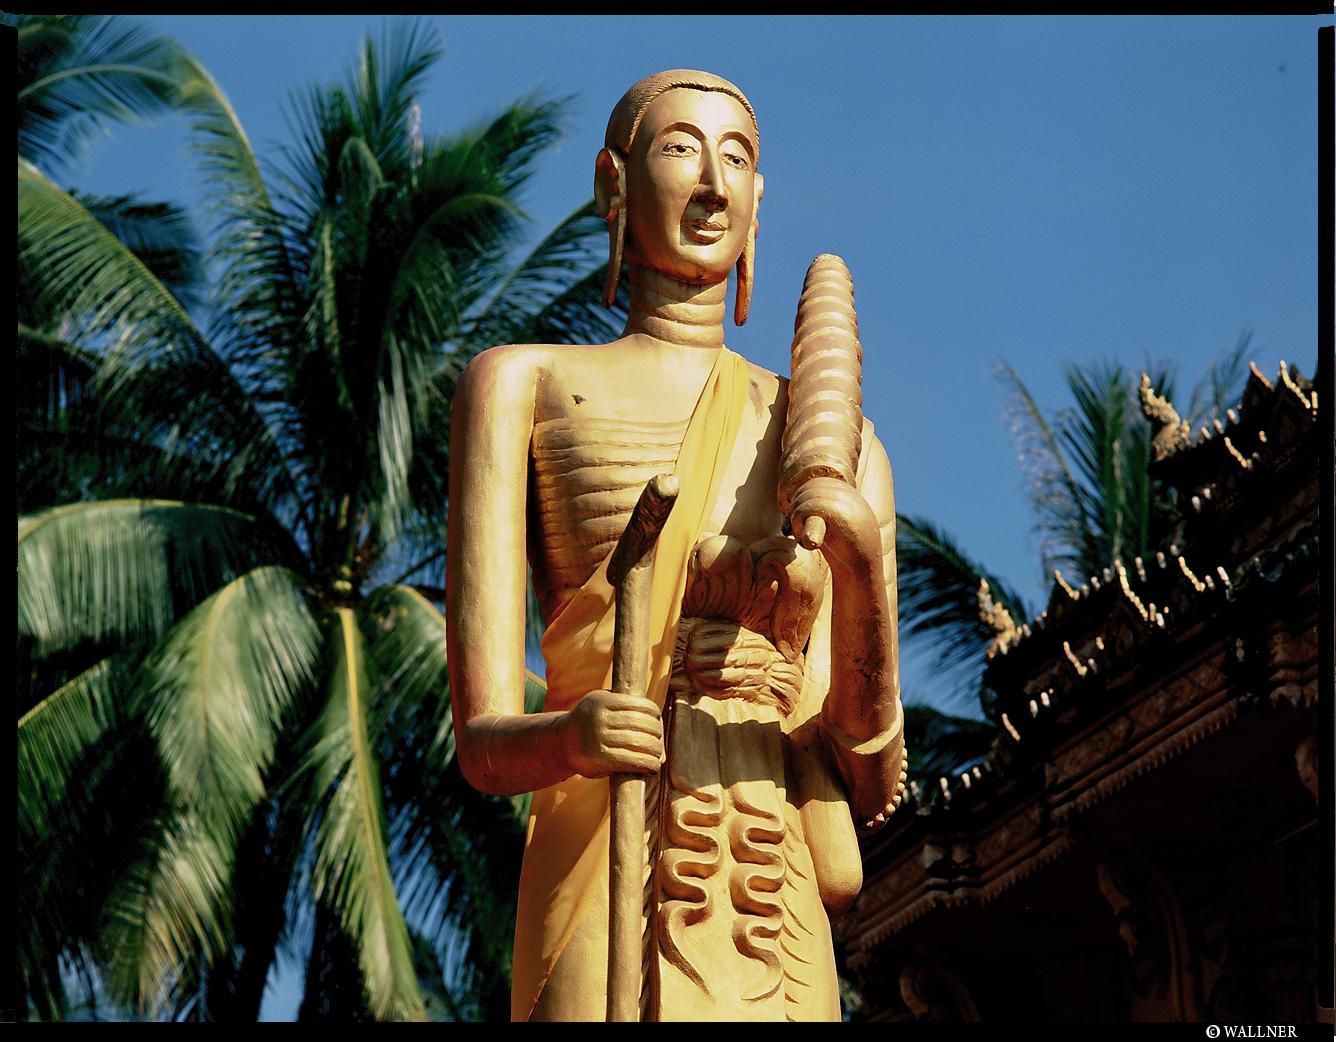 MediumFormatPatrikWallner_Vientiane_SkinnyLongEarsLOWQ